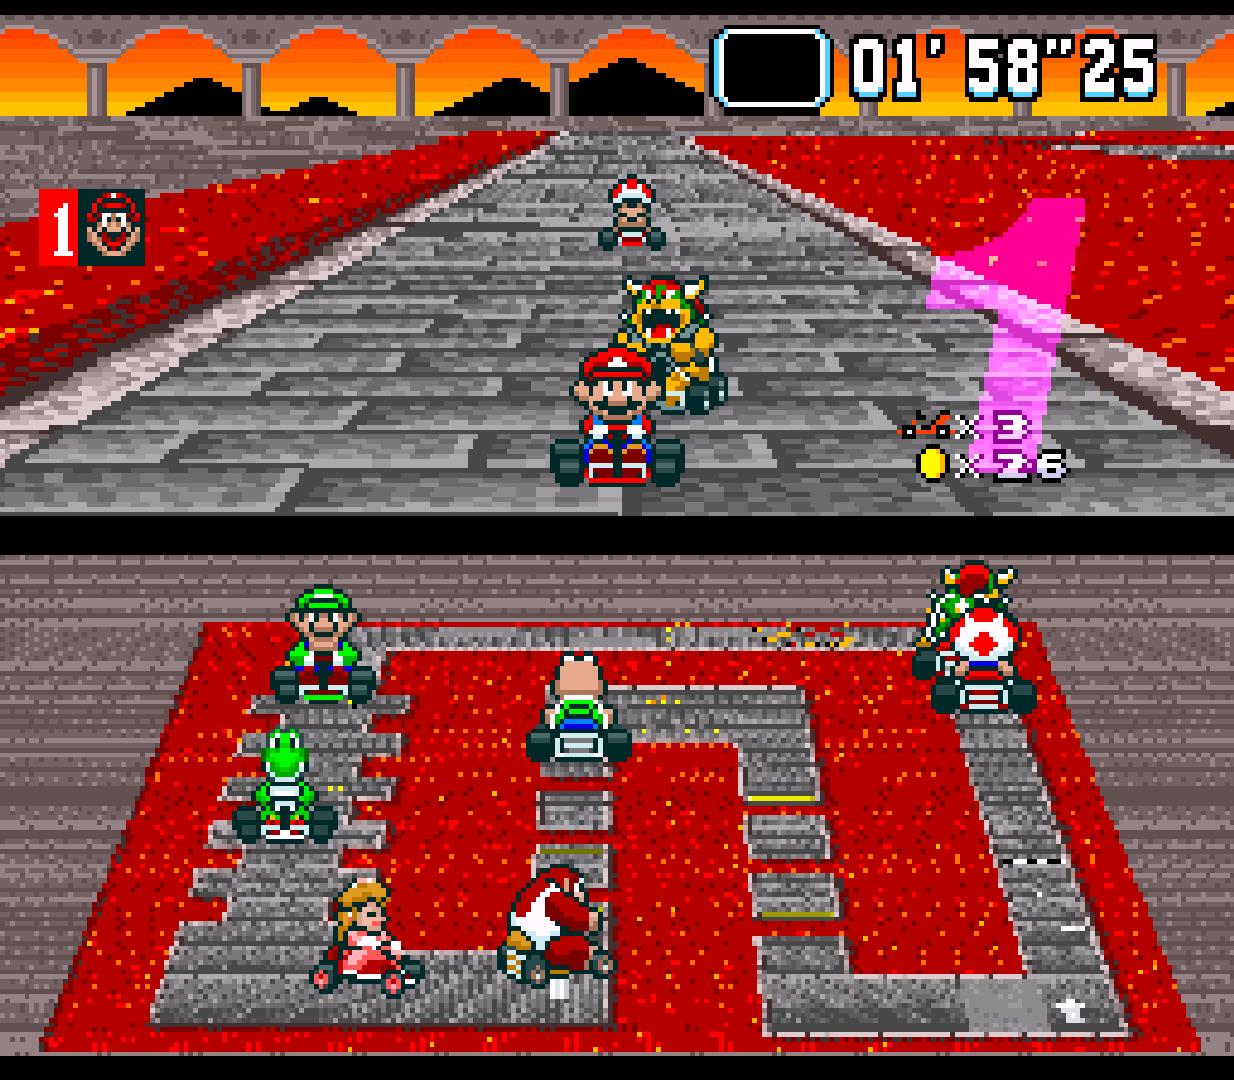 35743-Super_Mario_Kart_(Japan)_(Rev_0A)-1458959017